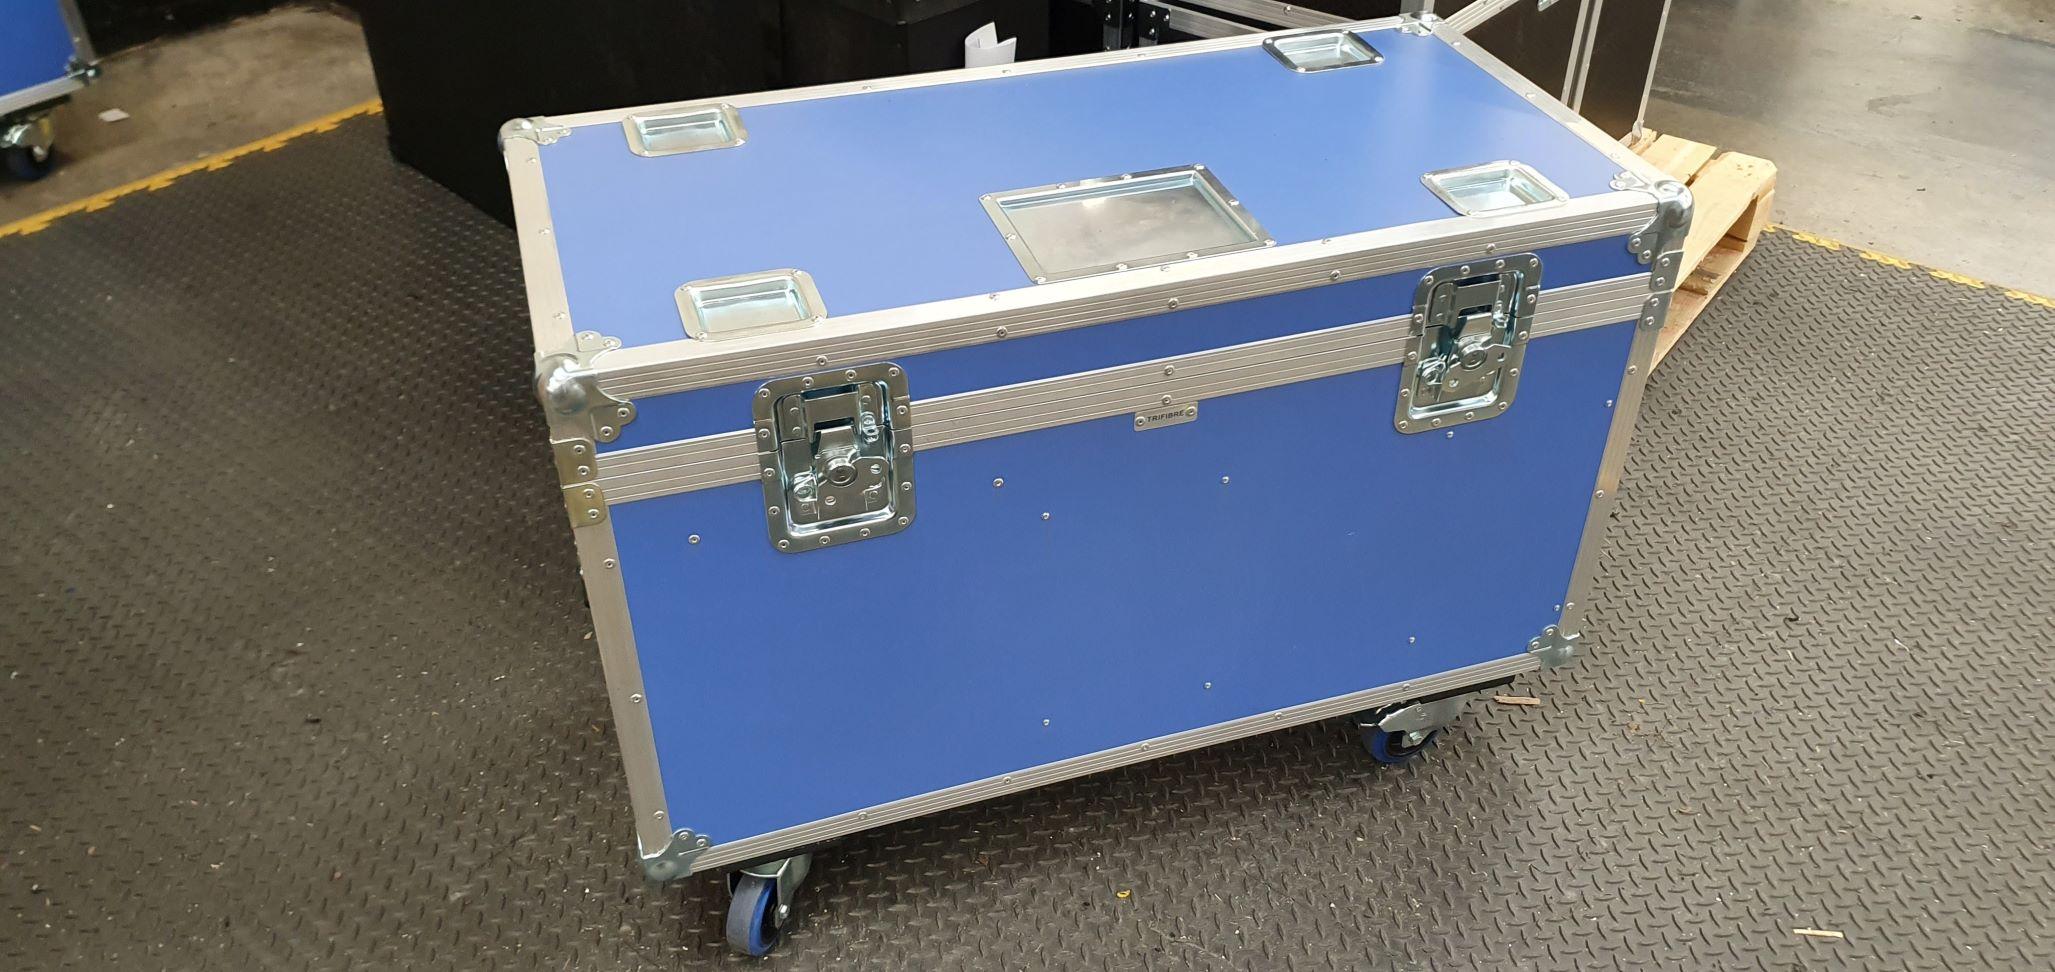 Road Trunk Flight Case - 2 Compartments & Adjustable Division Slots